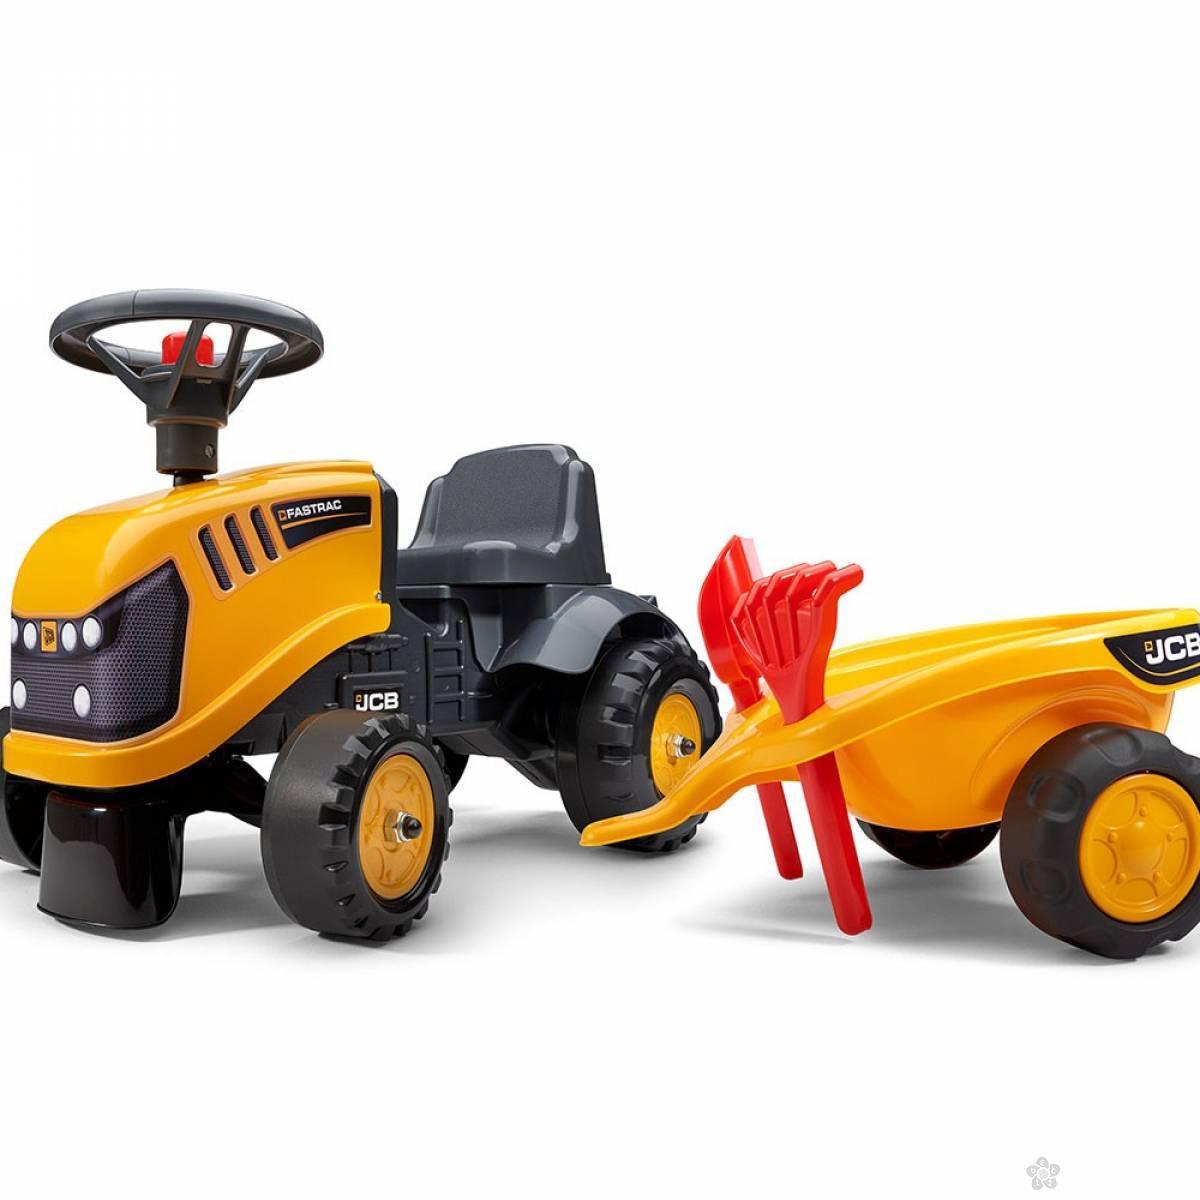 Traktor guralica JCB 215c